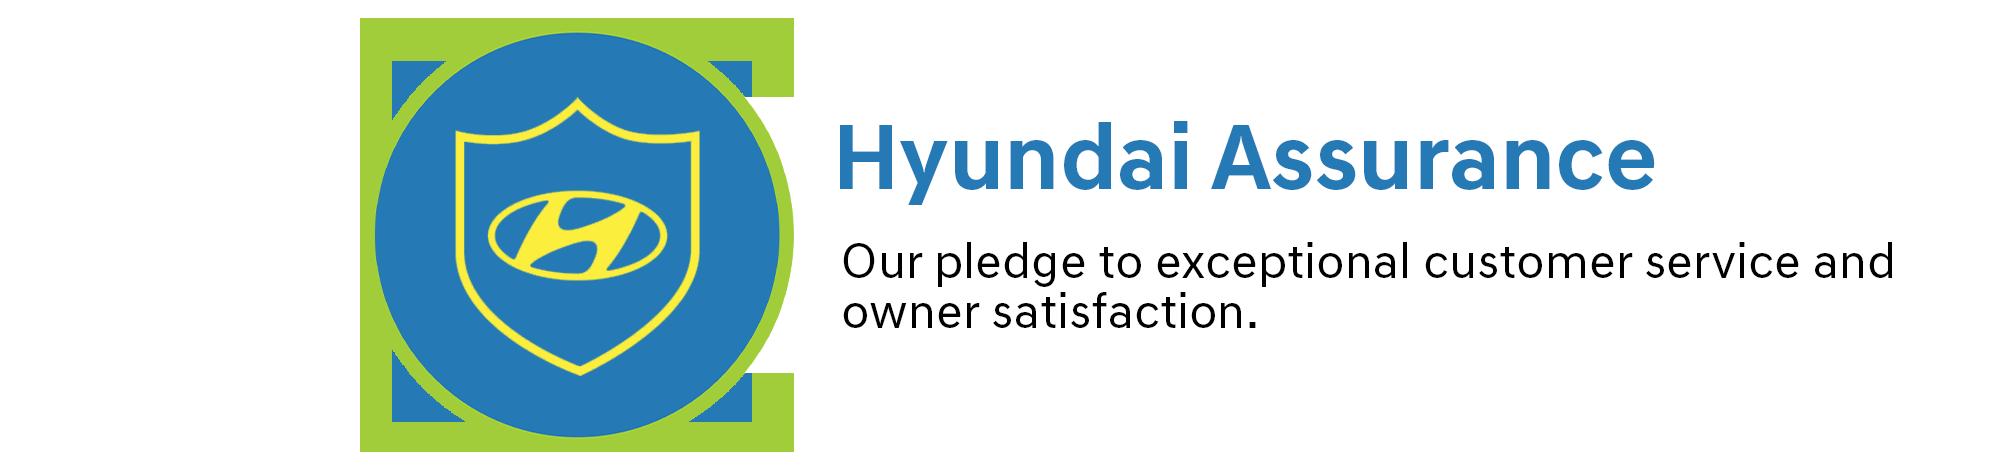 Allen Hyundai - Hundai Assurance